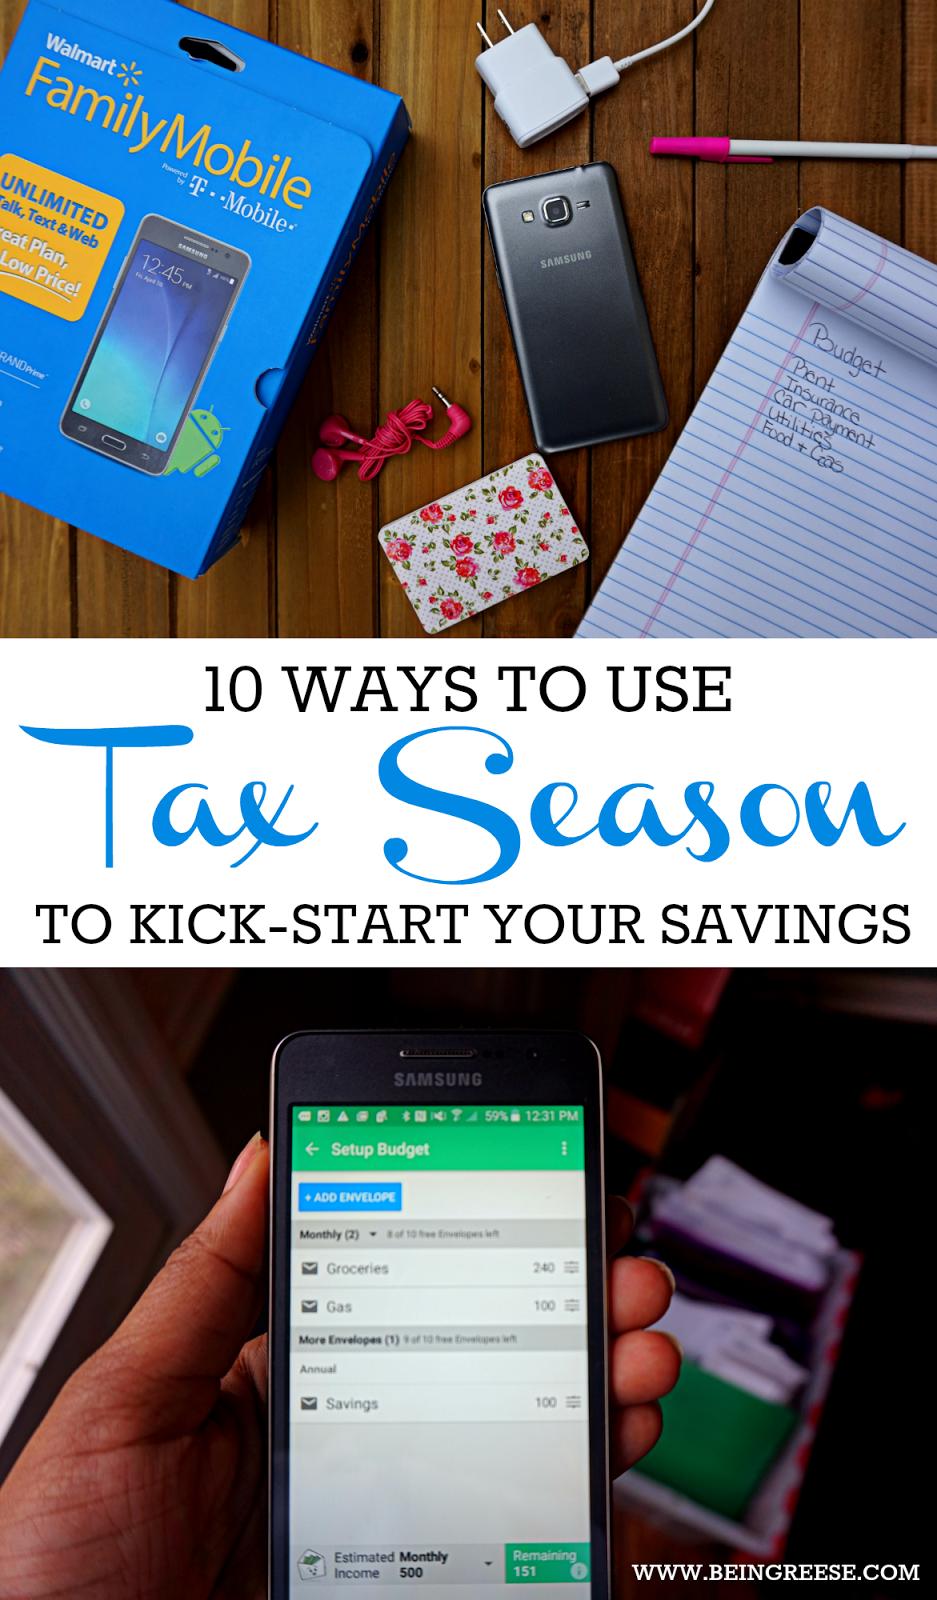 10 simple ways to increase your savings during tax season